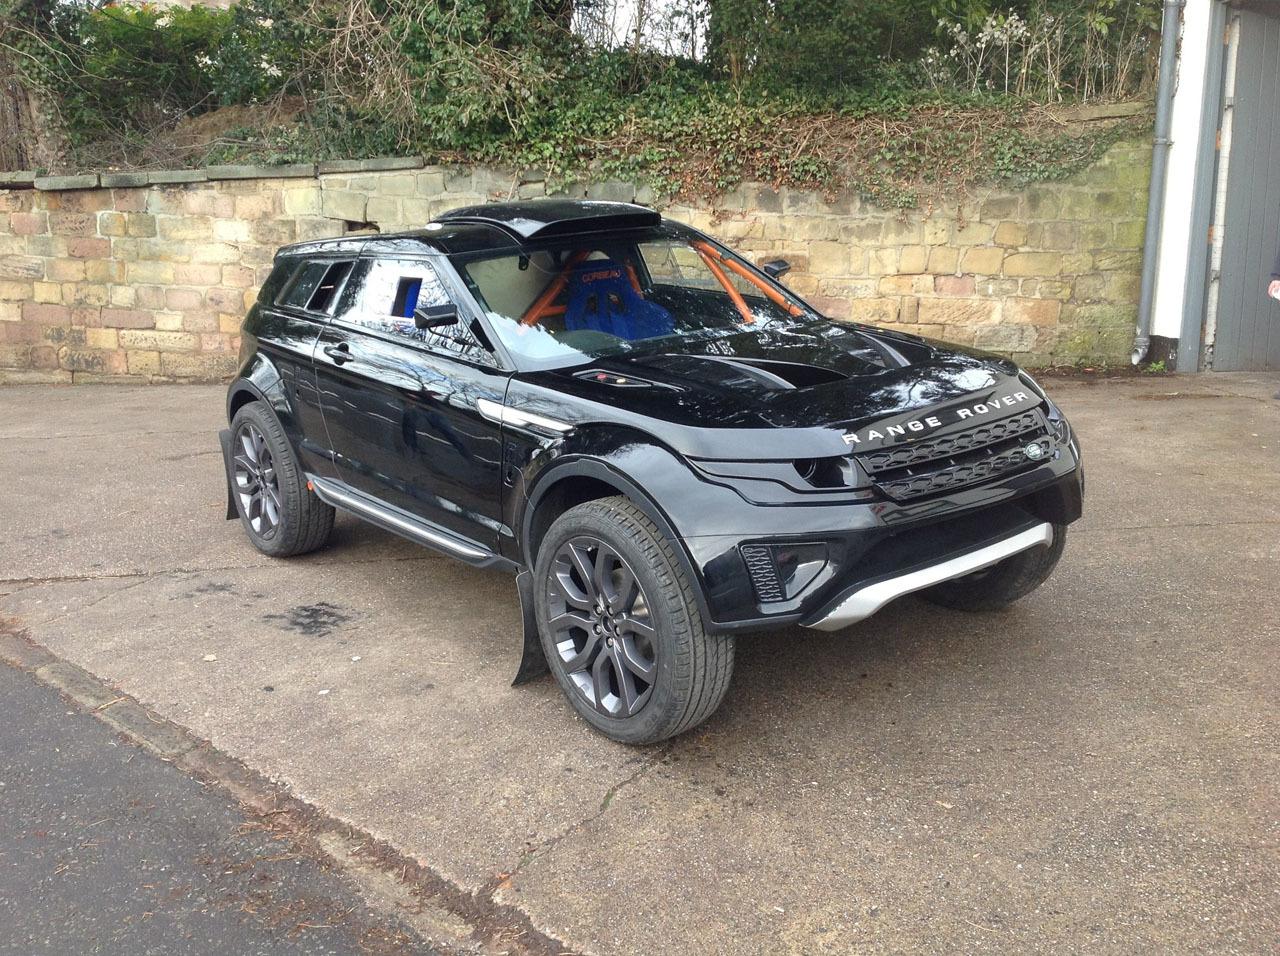 milner-lrm-1-la-range-rover-evoque-da-rally_0-100_1